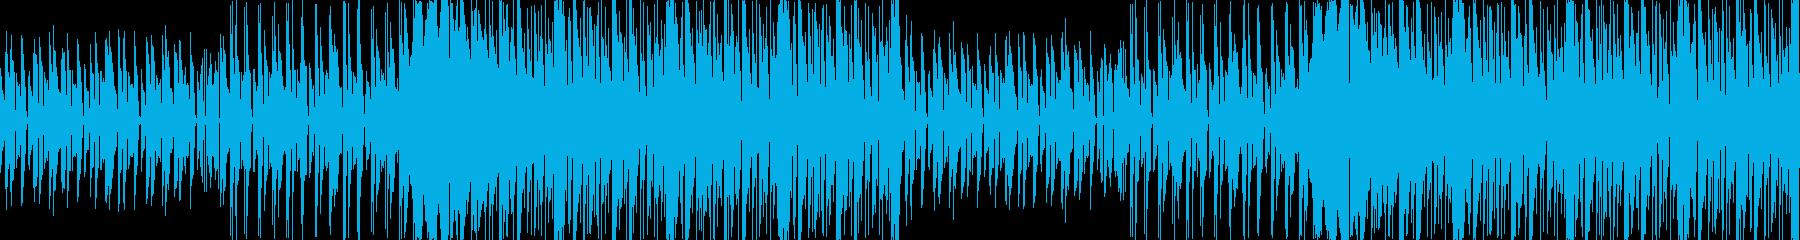 【★EDM/ダンス/ポップ/エレクトロ】の再生済みの波形